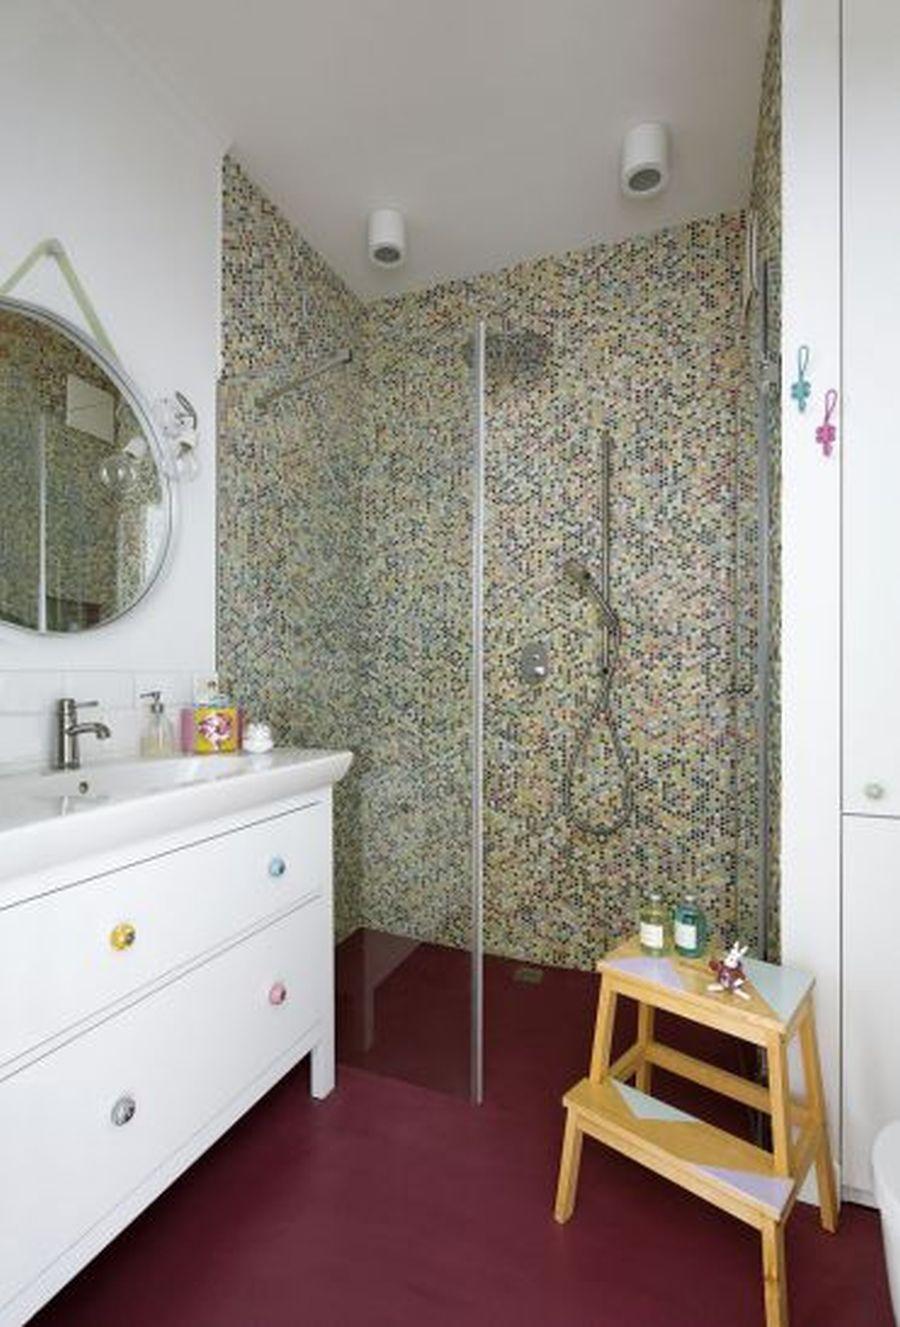 adelaparvu.com despre apartament in culori pastelate, Designer Patricia Rabinska, Foto Yassen Hristov (1)